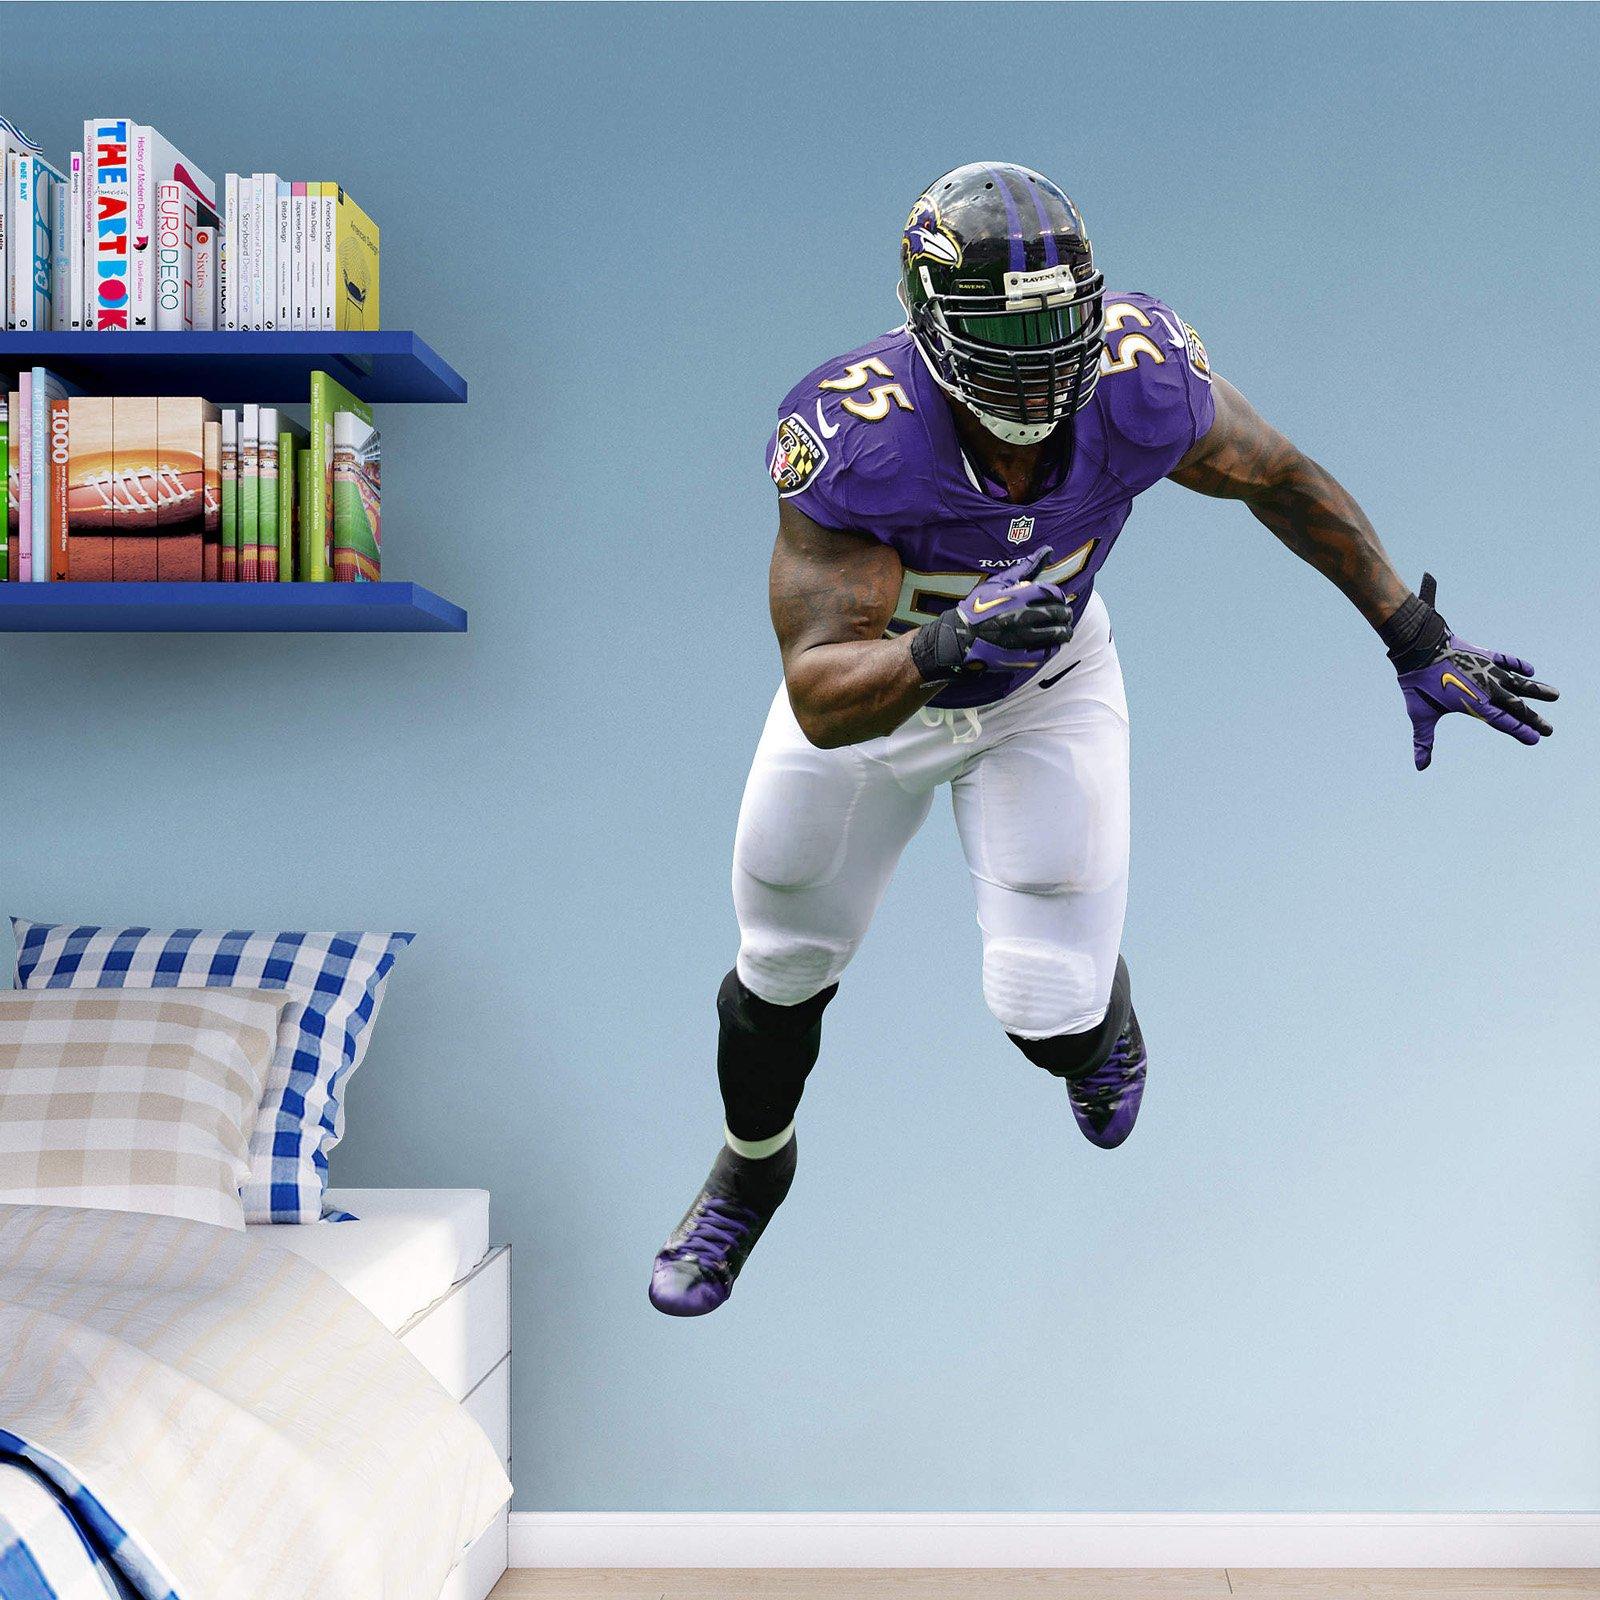 & Fathead NFL Baltimore Ravens Terrell Suggs Wall Decal - Walmart.com